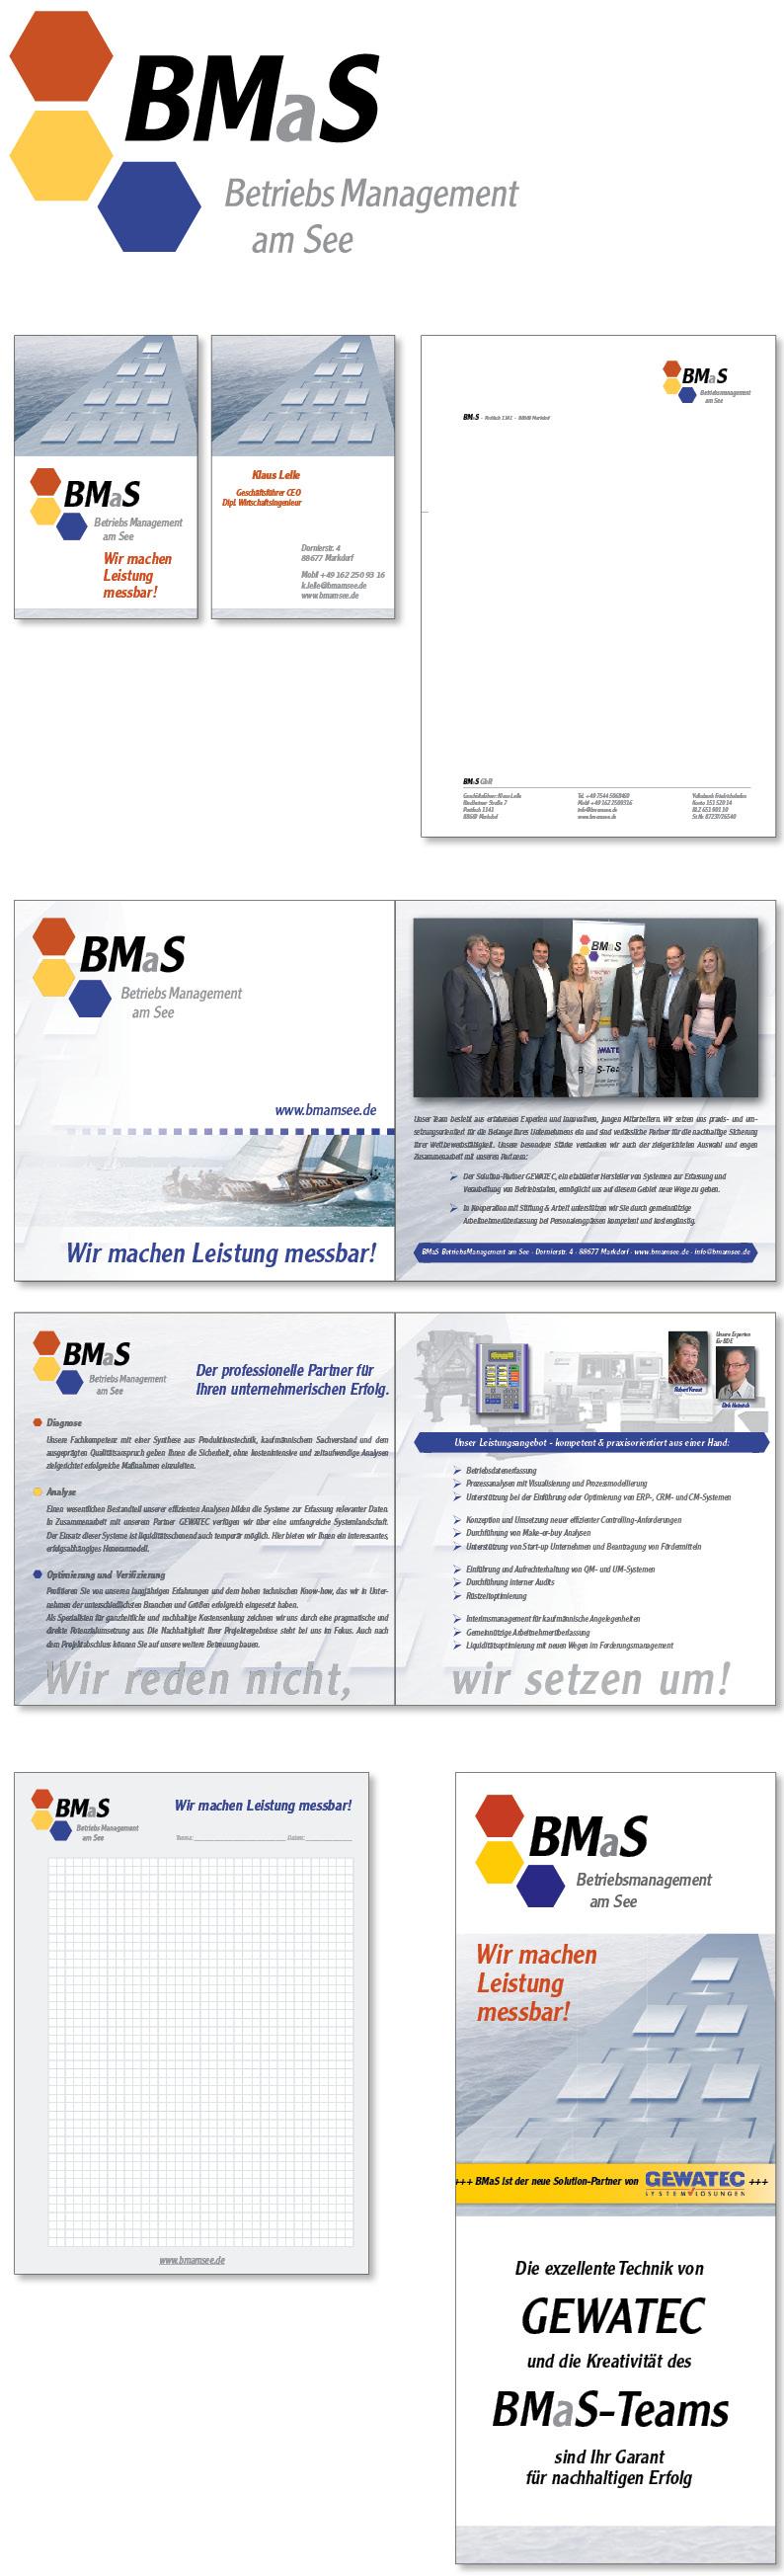 BMaS Referenzen